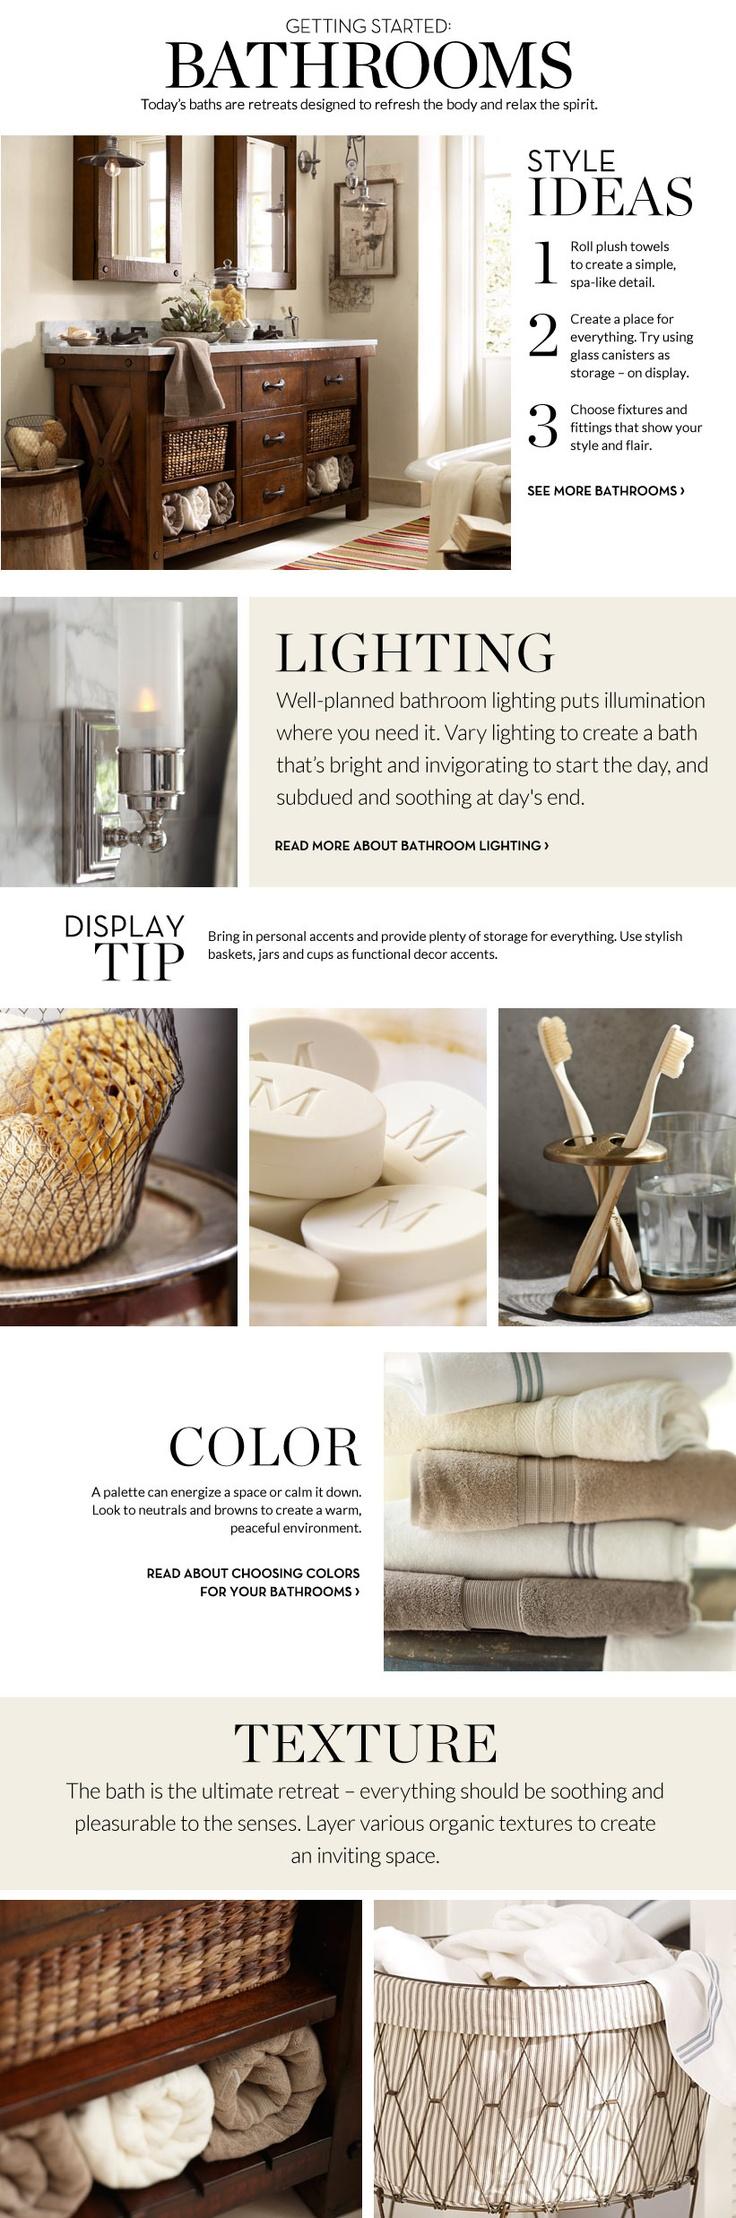 80572280805713709 Bathroom Decor & Decorating Ideas | Pottery Barn ...